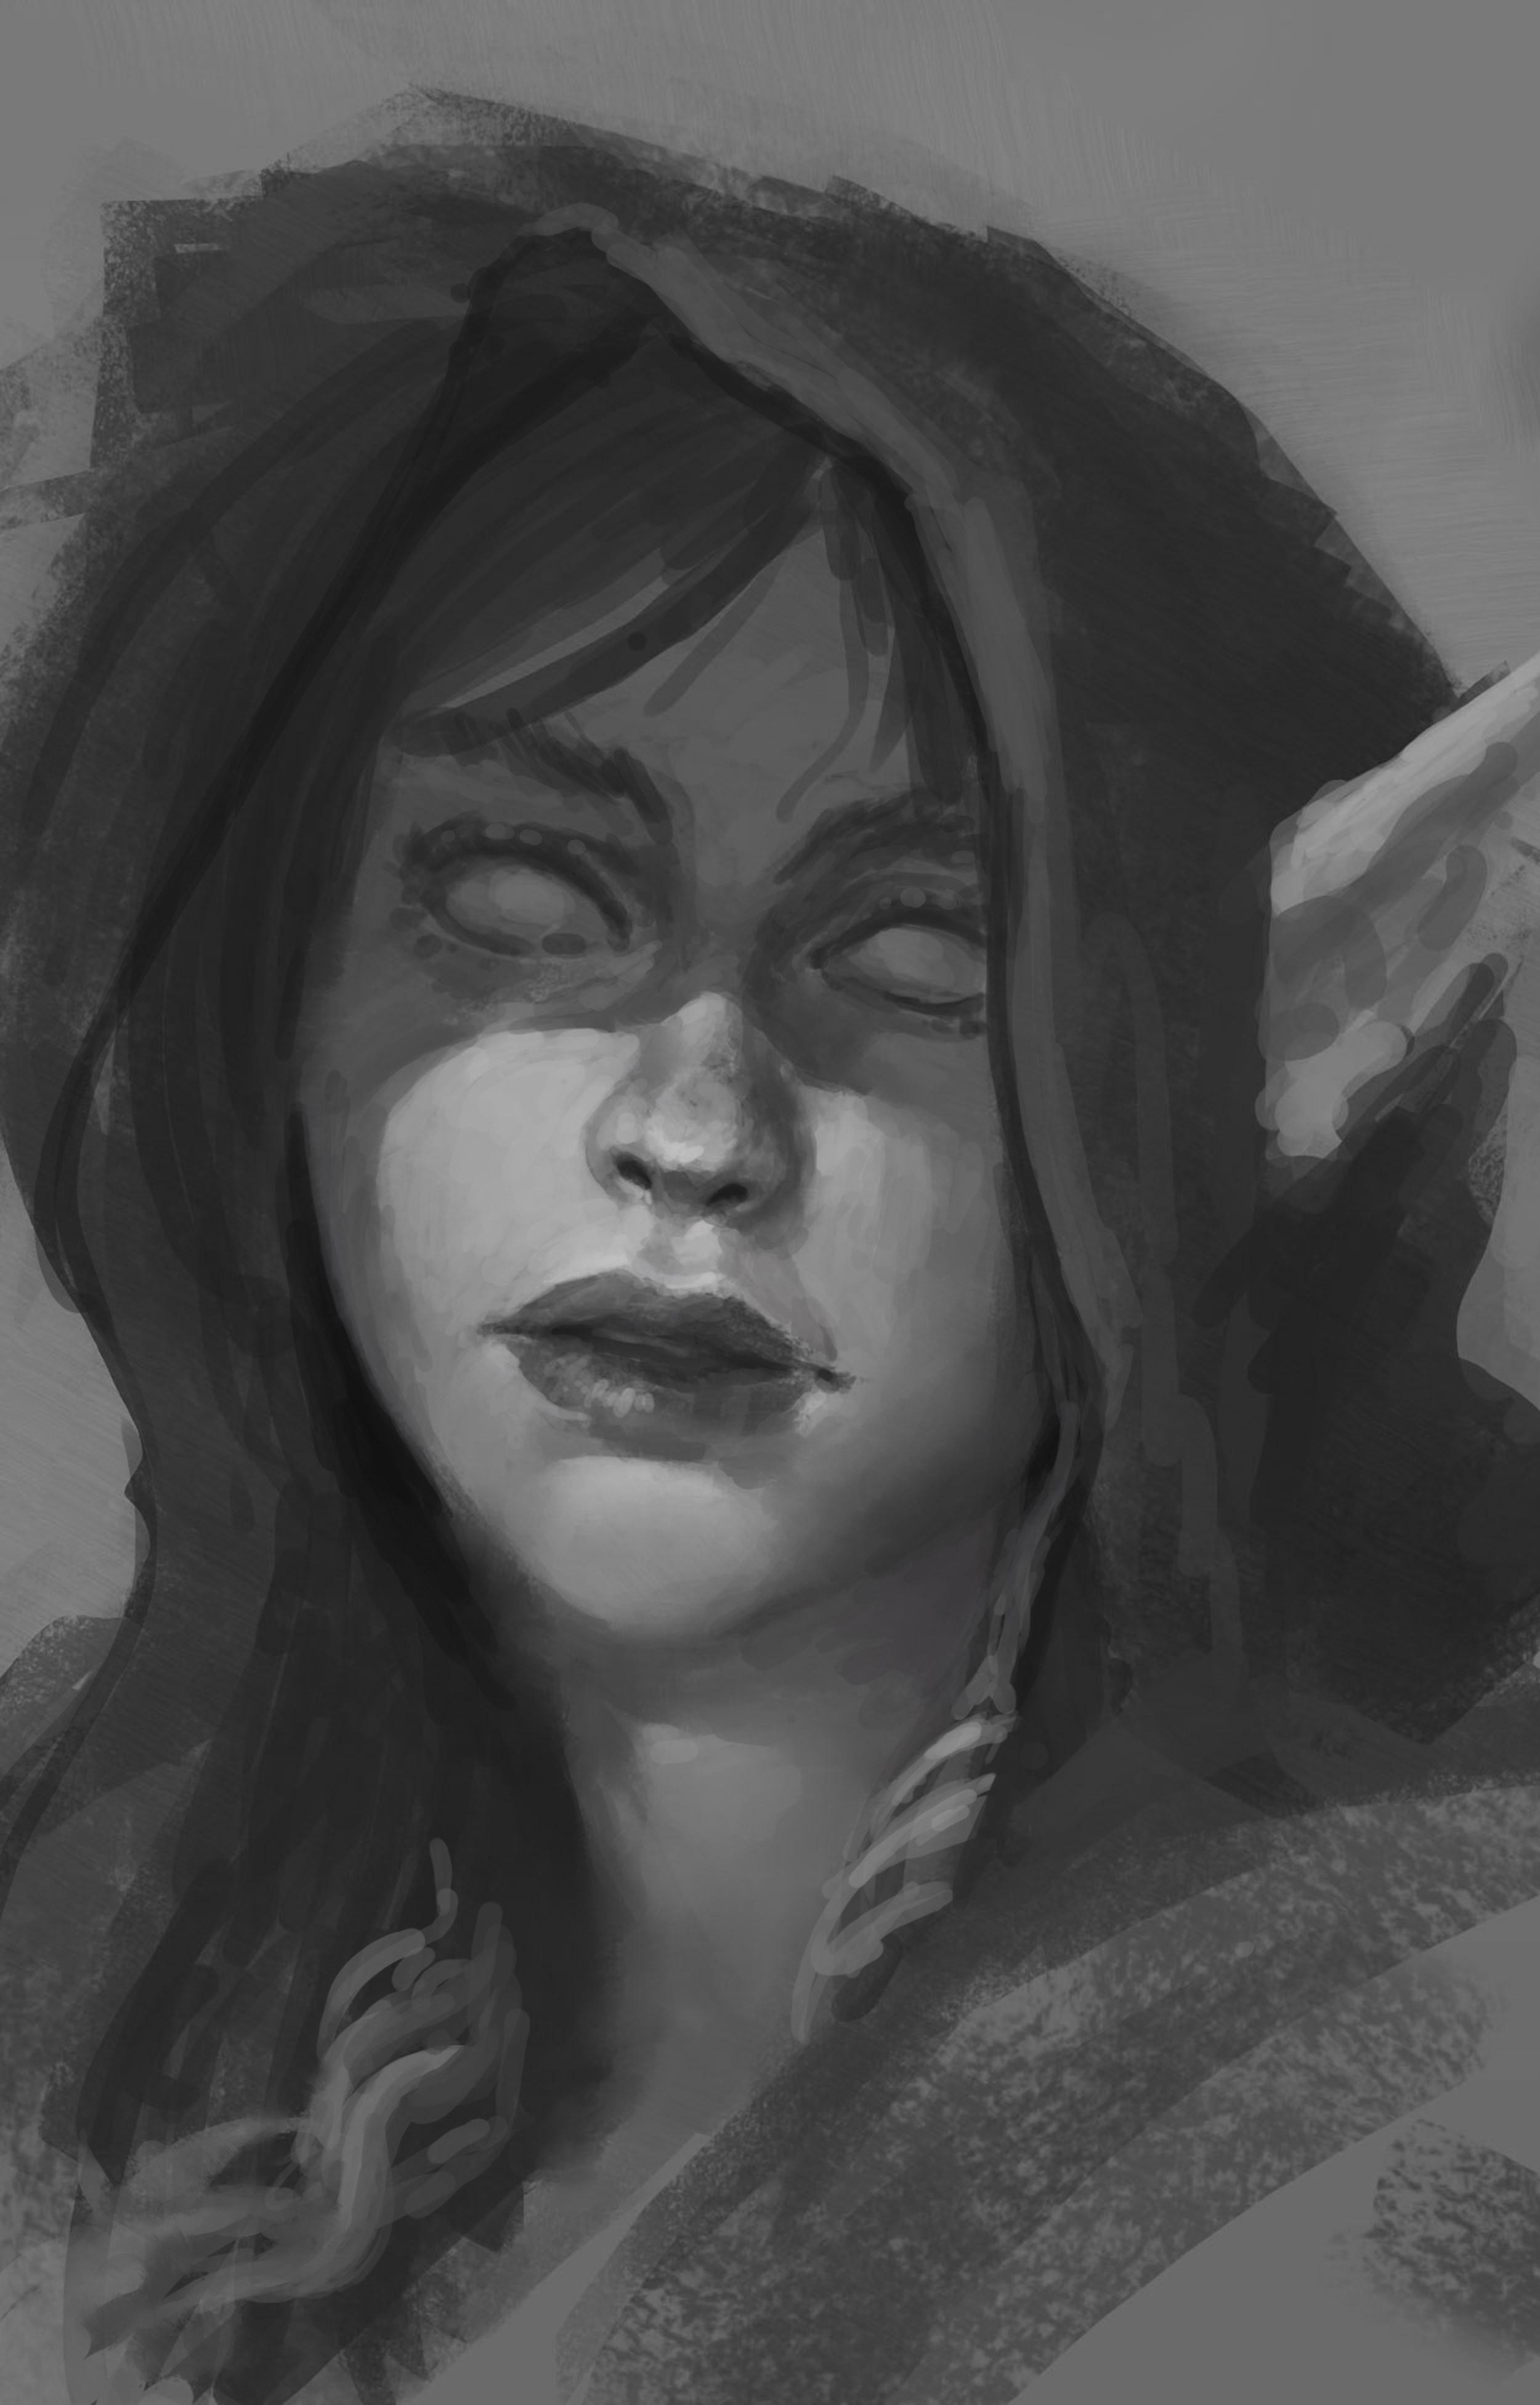 30 min sketch